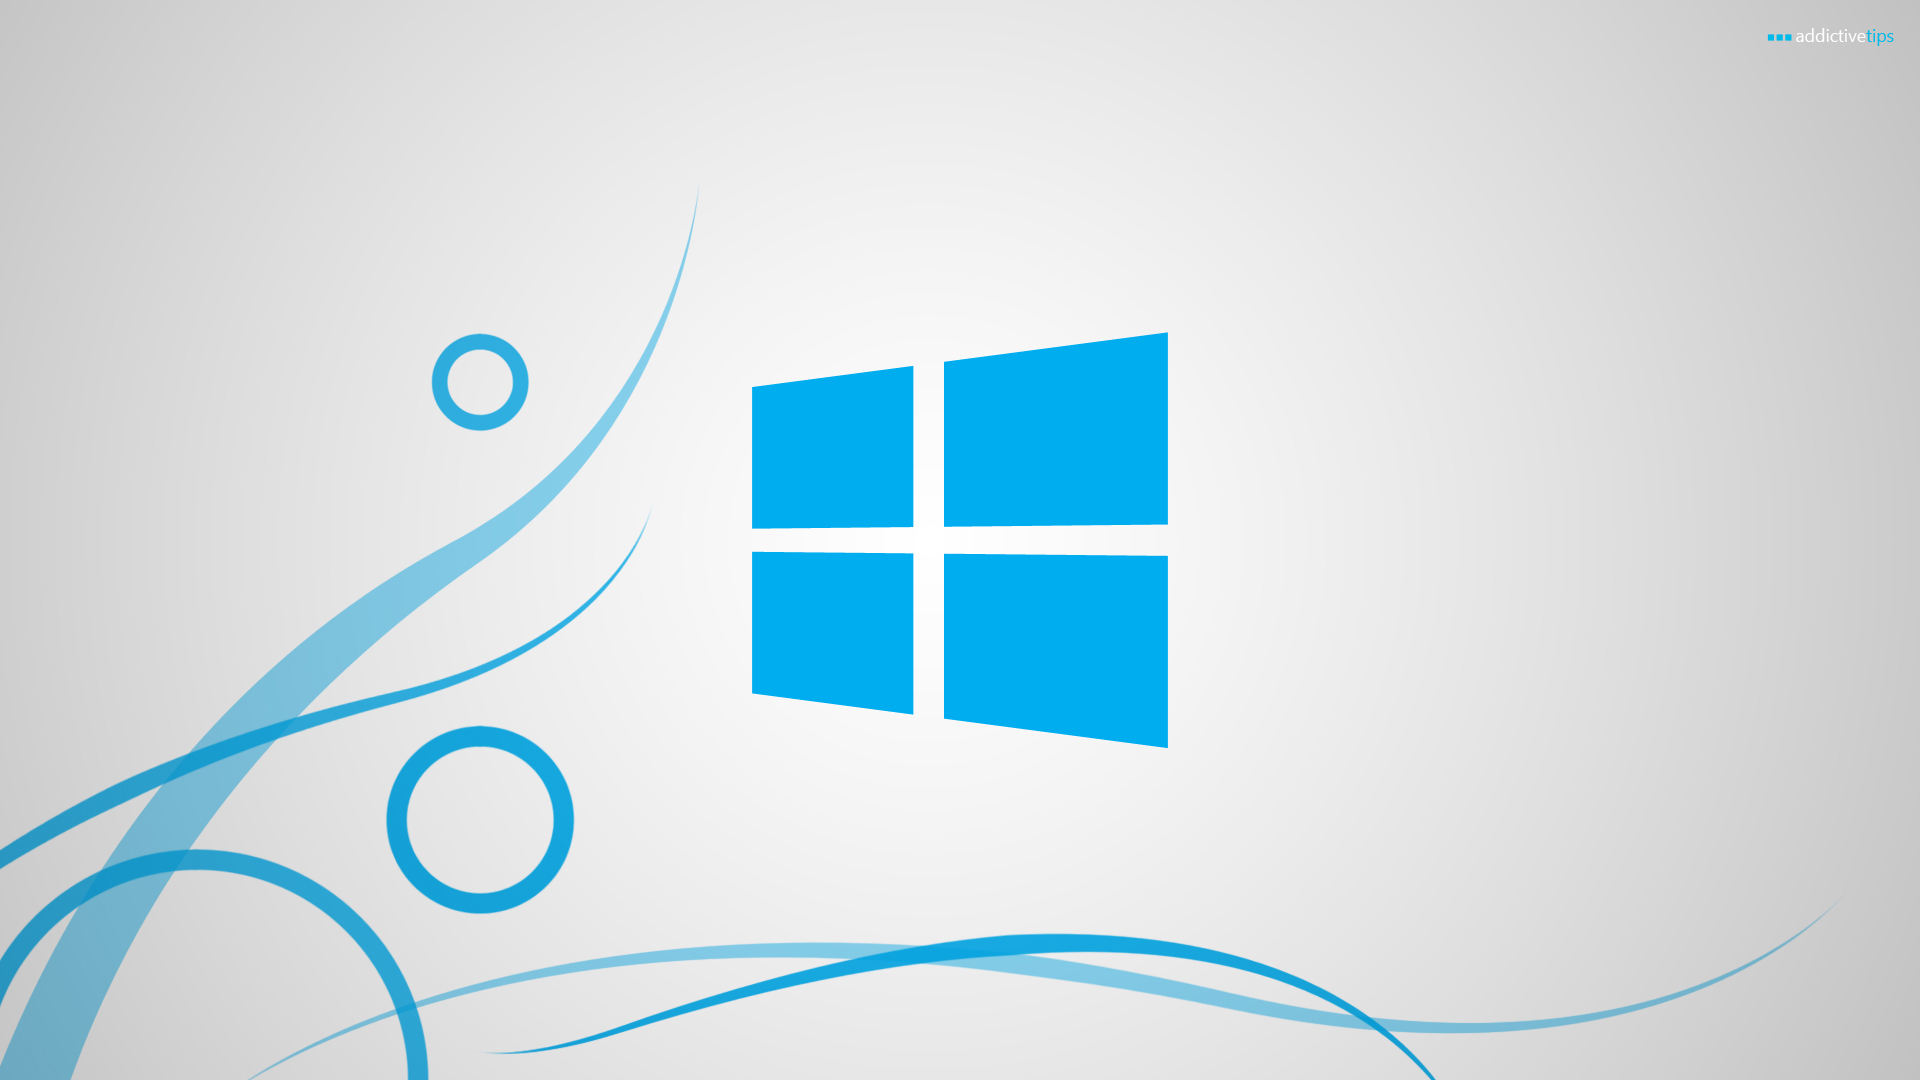 Windows-Seen-http-wallpho-tk-windows-seen-html-wallpaper-wp30012257